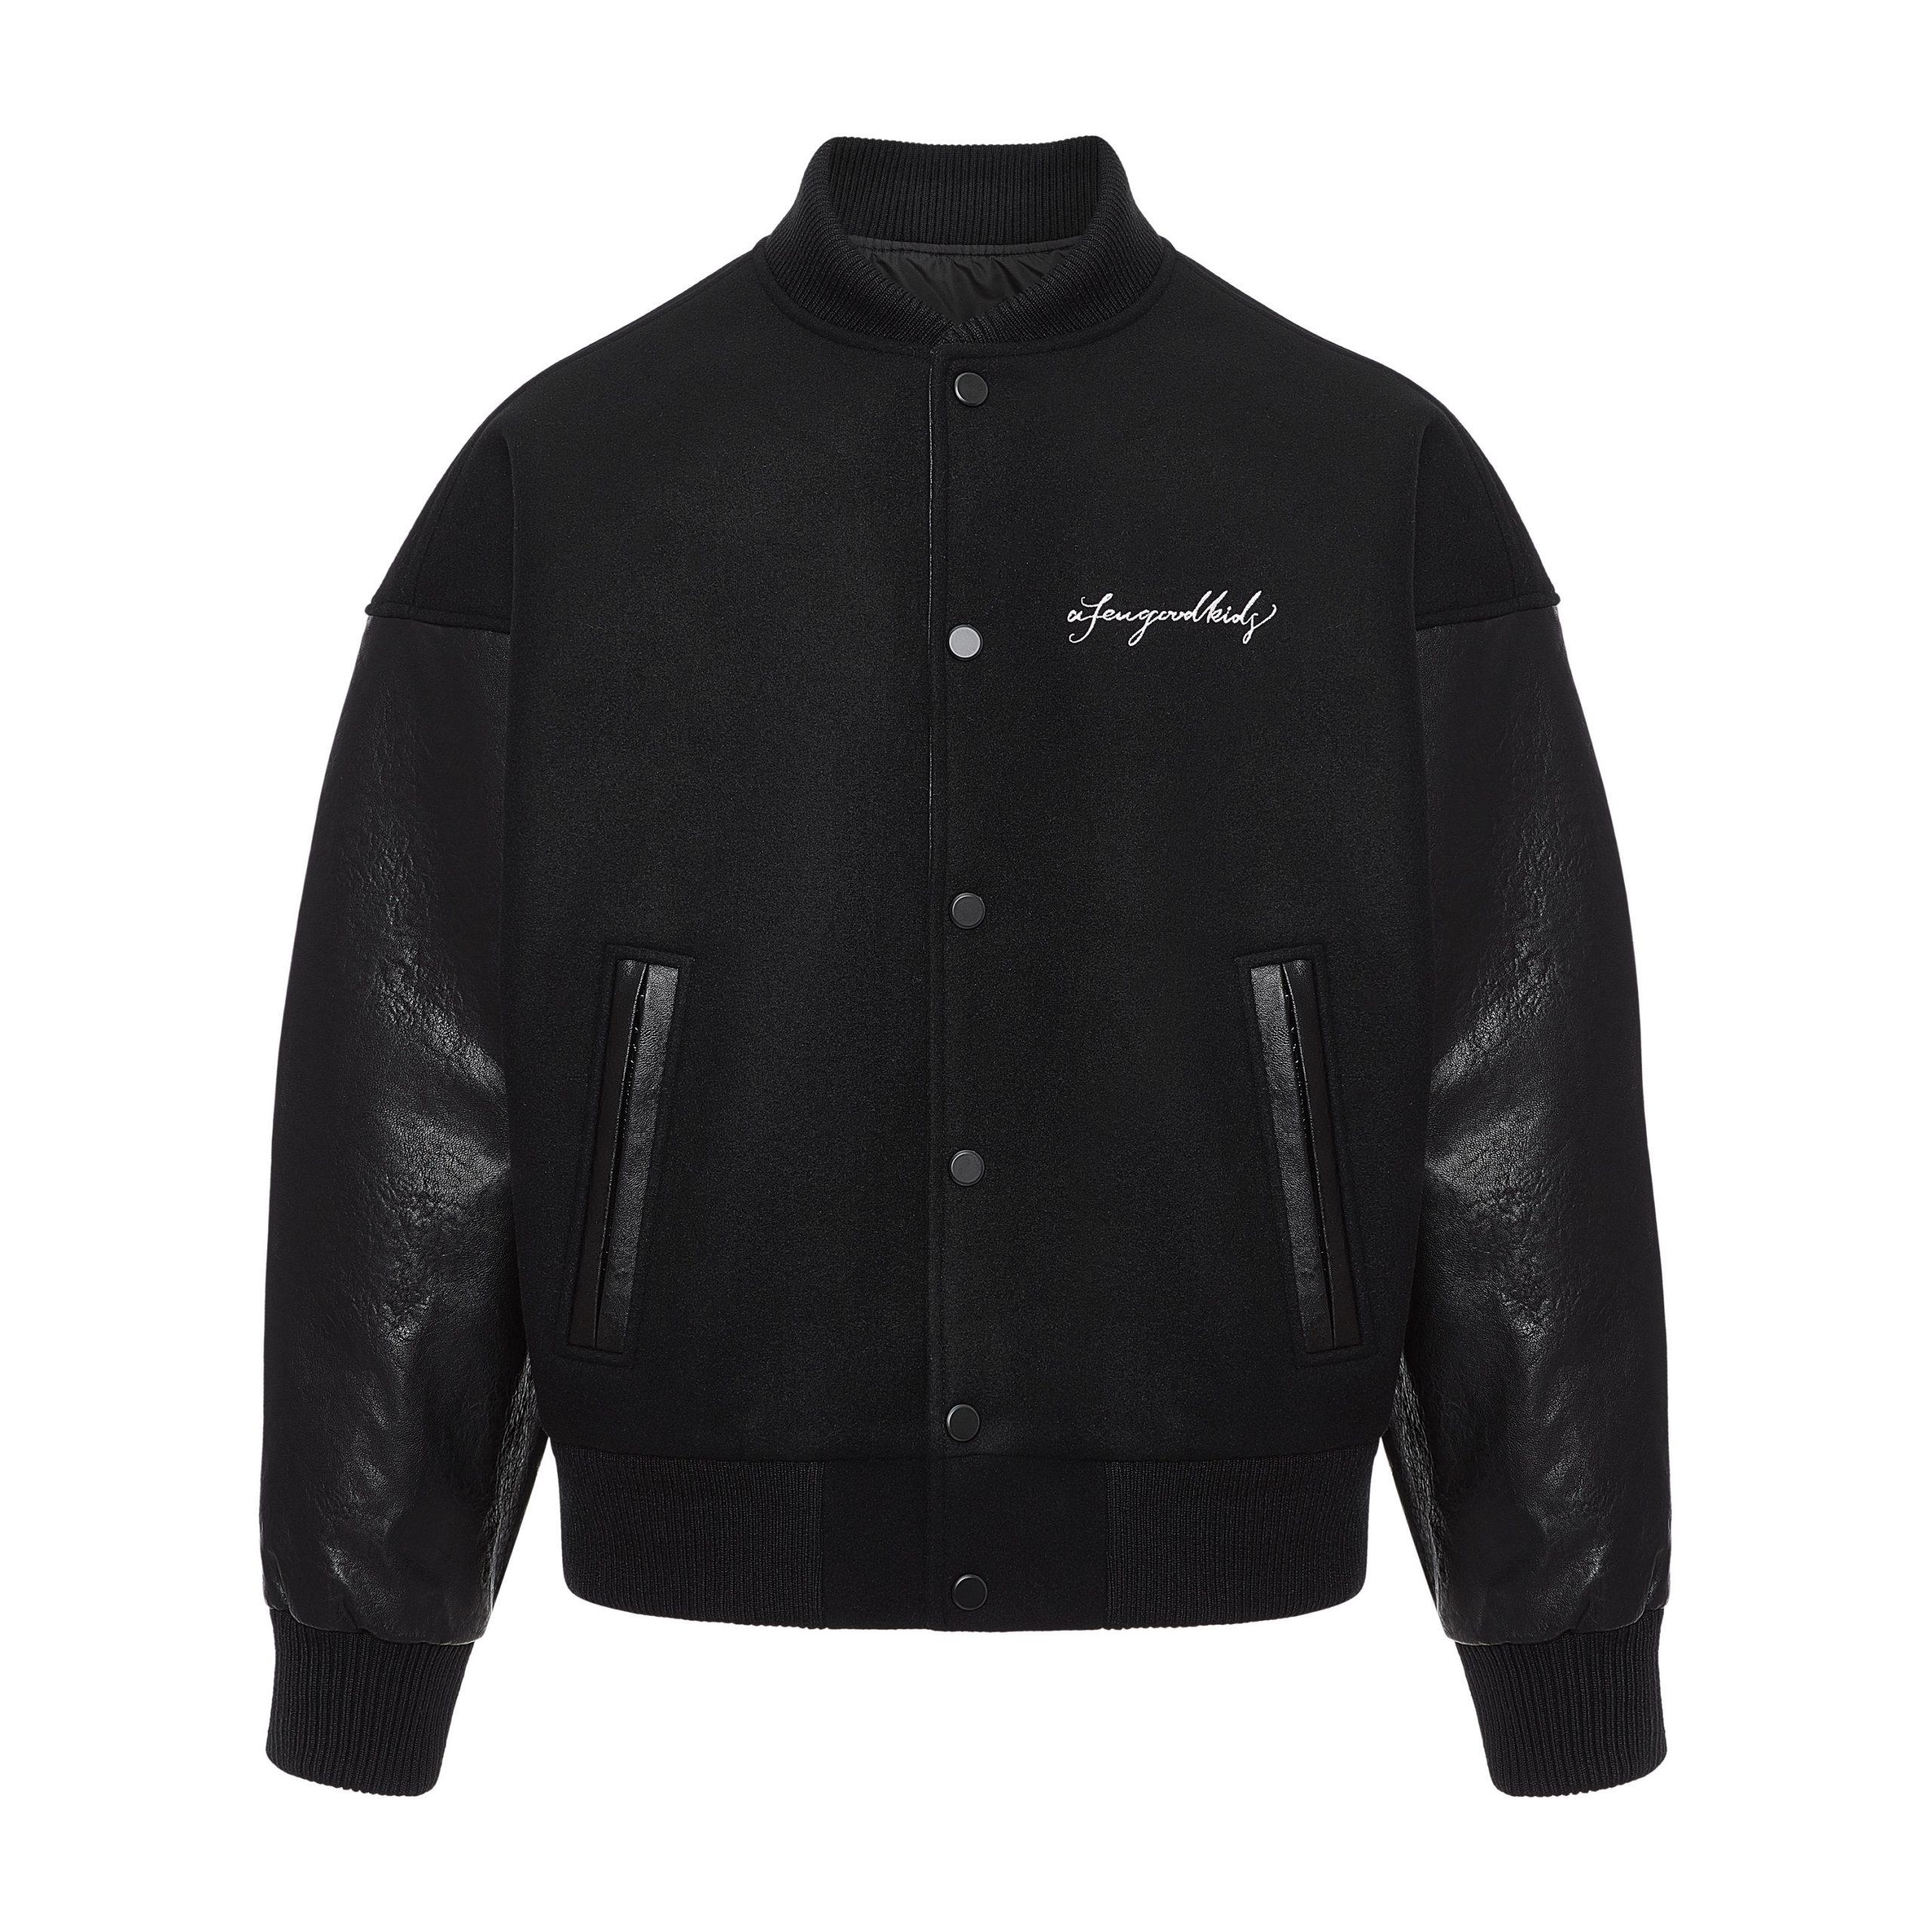 A Few Good Kids AFGK Ma Siwei Hip Hop Streetwear Bomber Varsity Jacket